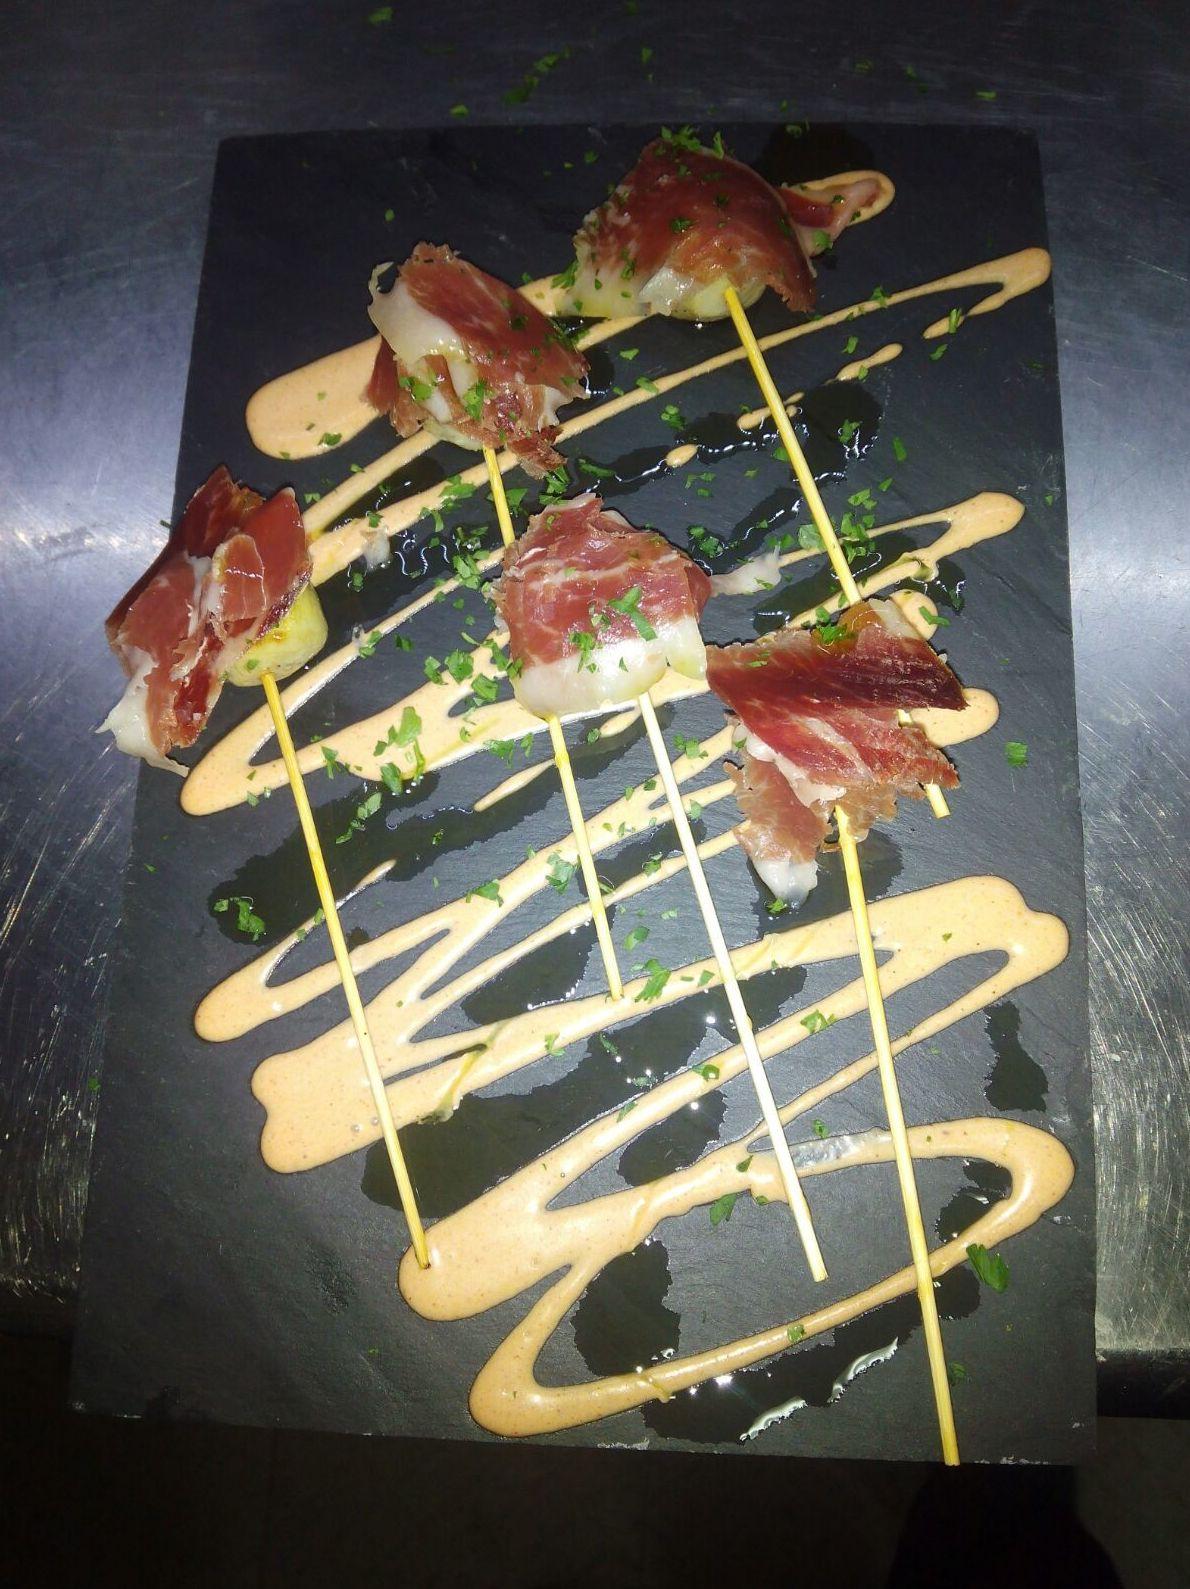 Chupachups de corazones de alcachofas con jamón ibérico Restaurante gallego A Cañiza Villaverde